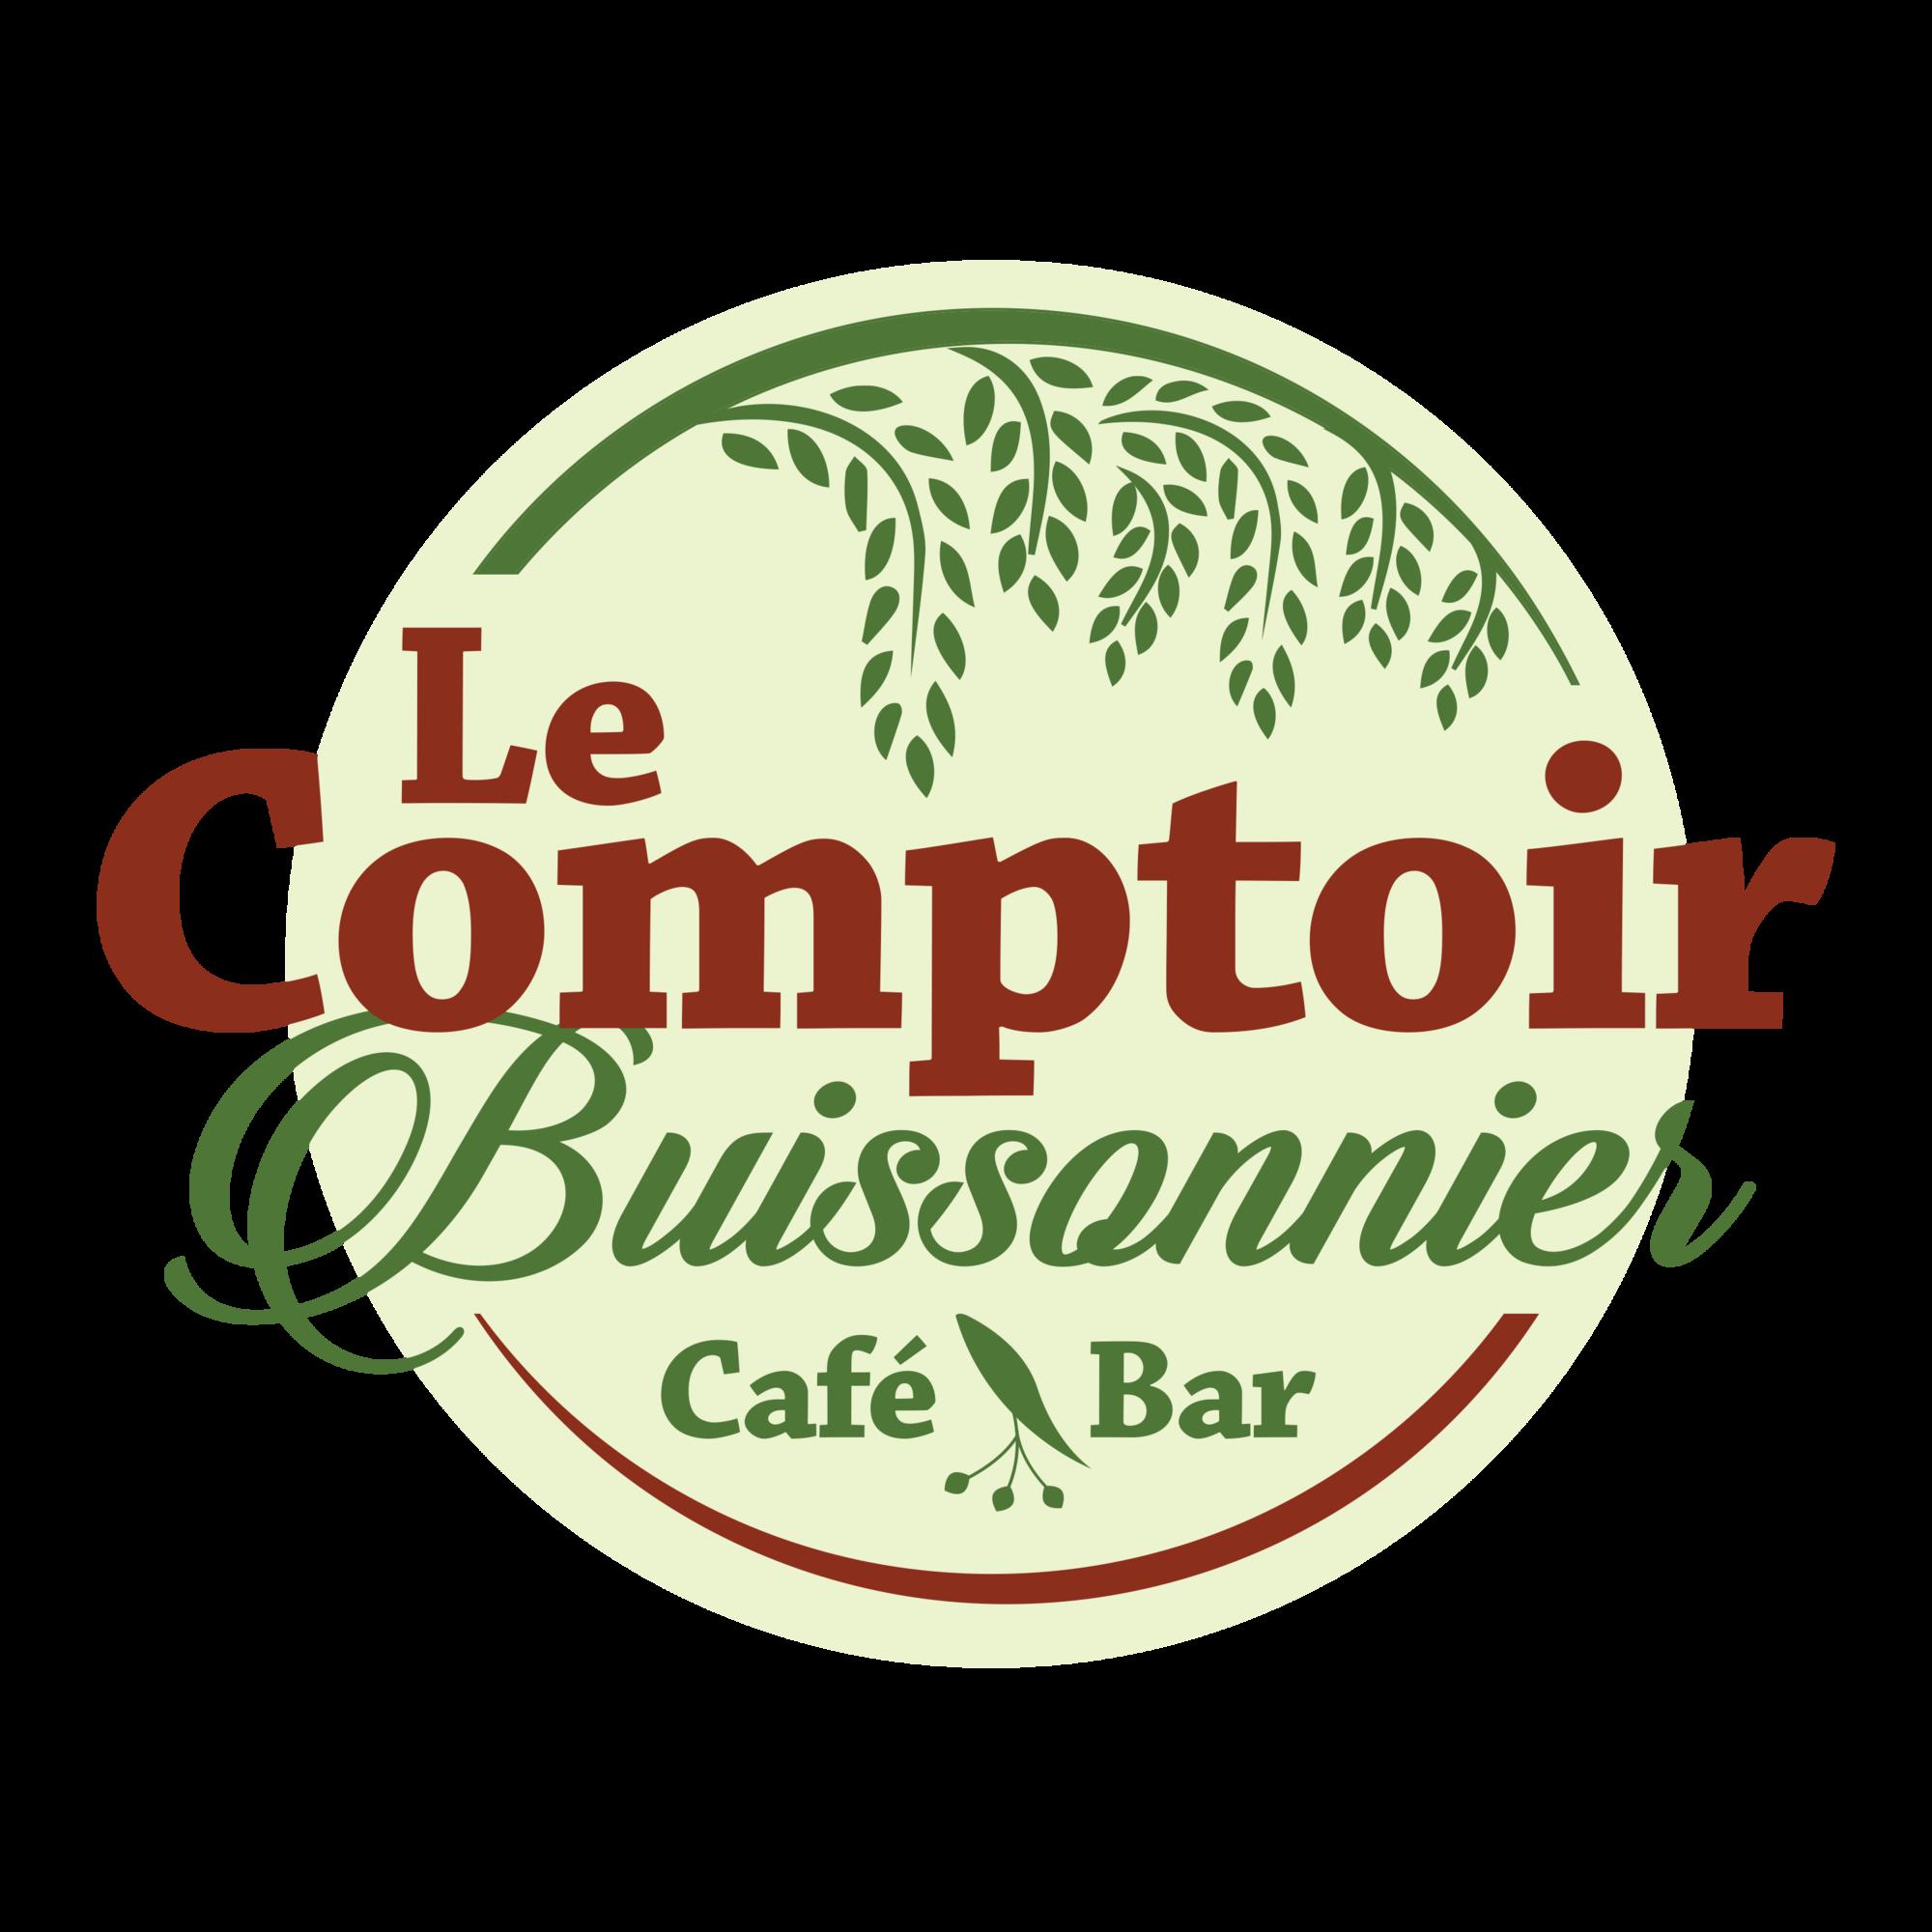 Le Comptoir Buissonnier